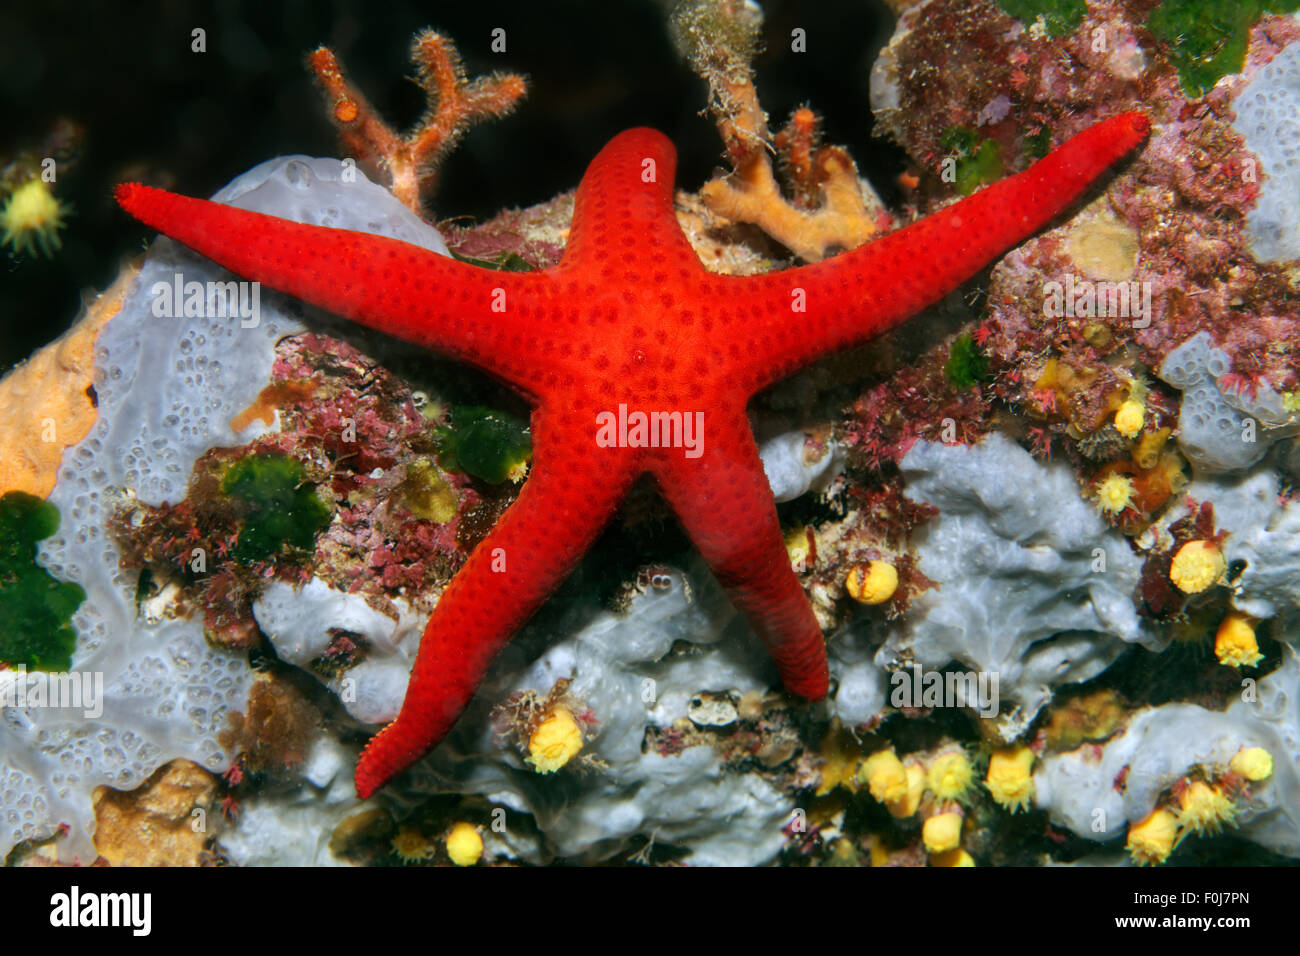 Red starfish (Hacelia attenuata), Corfu, Ionian Islands, Ionian Sea, Mediterranean Sea, Greece - Stock Image